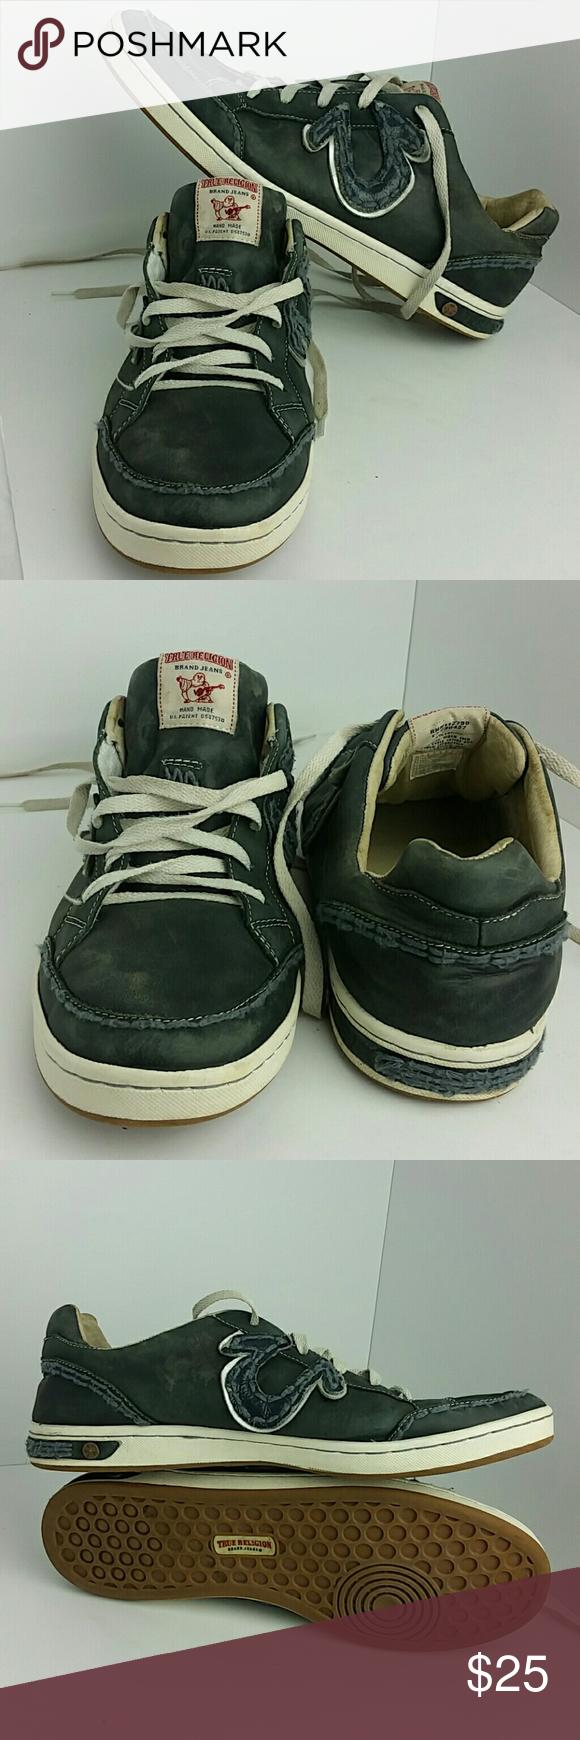 TRUE RELIGION MEN'S SHOES IN GOOD CONDITION   SKE # FM True Religion Shoes Sneakers